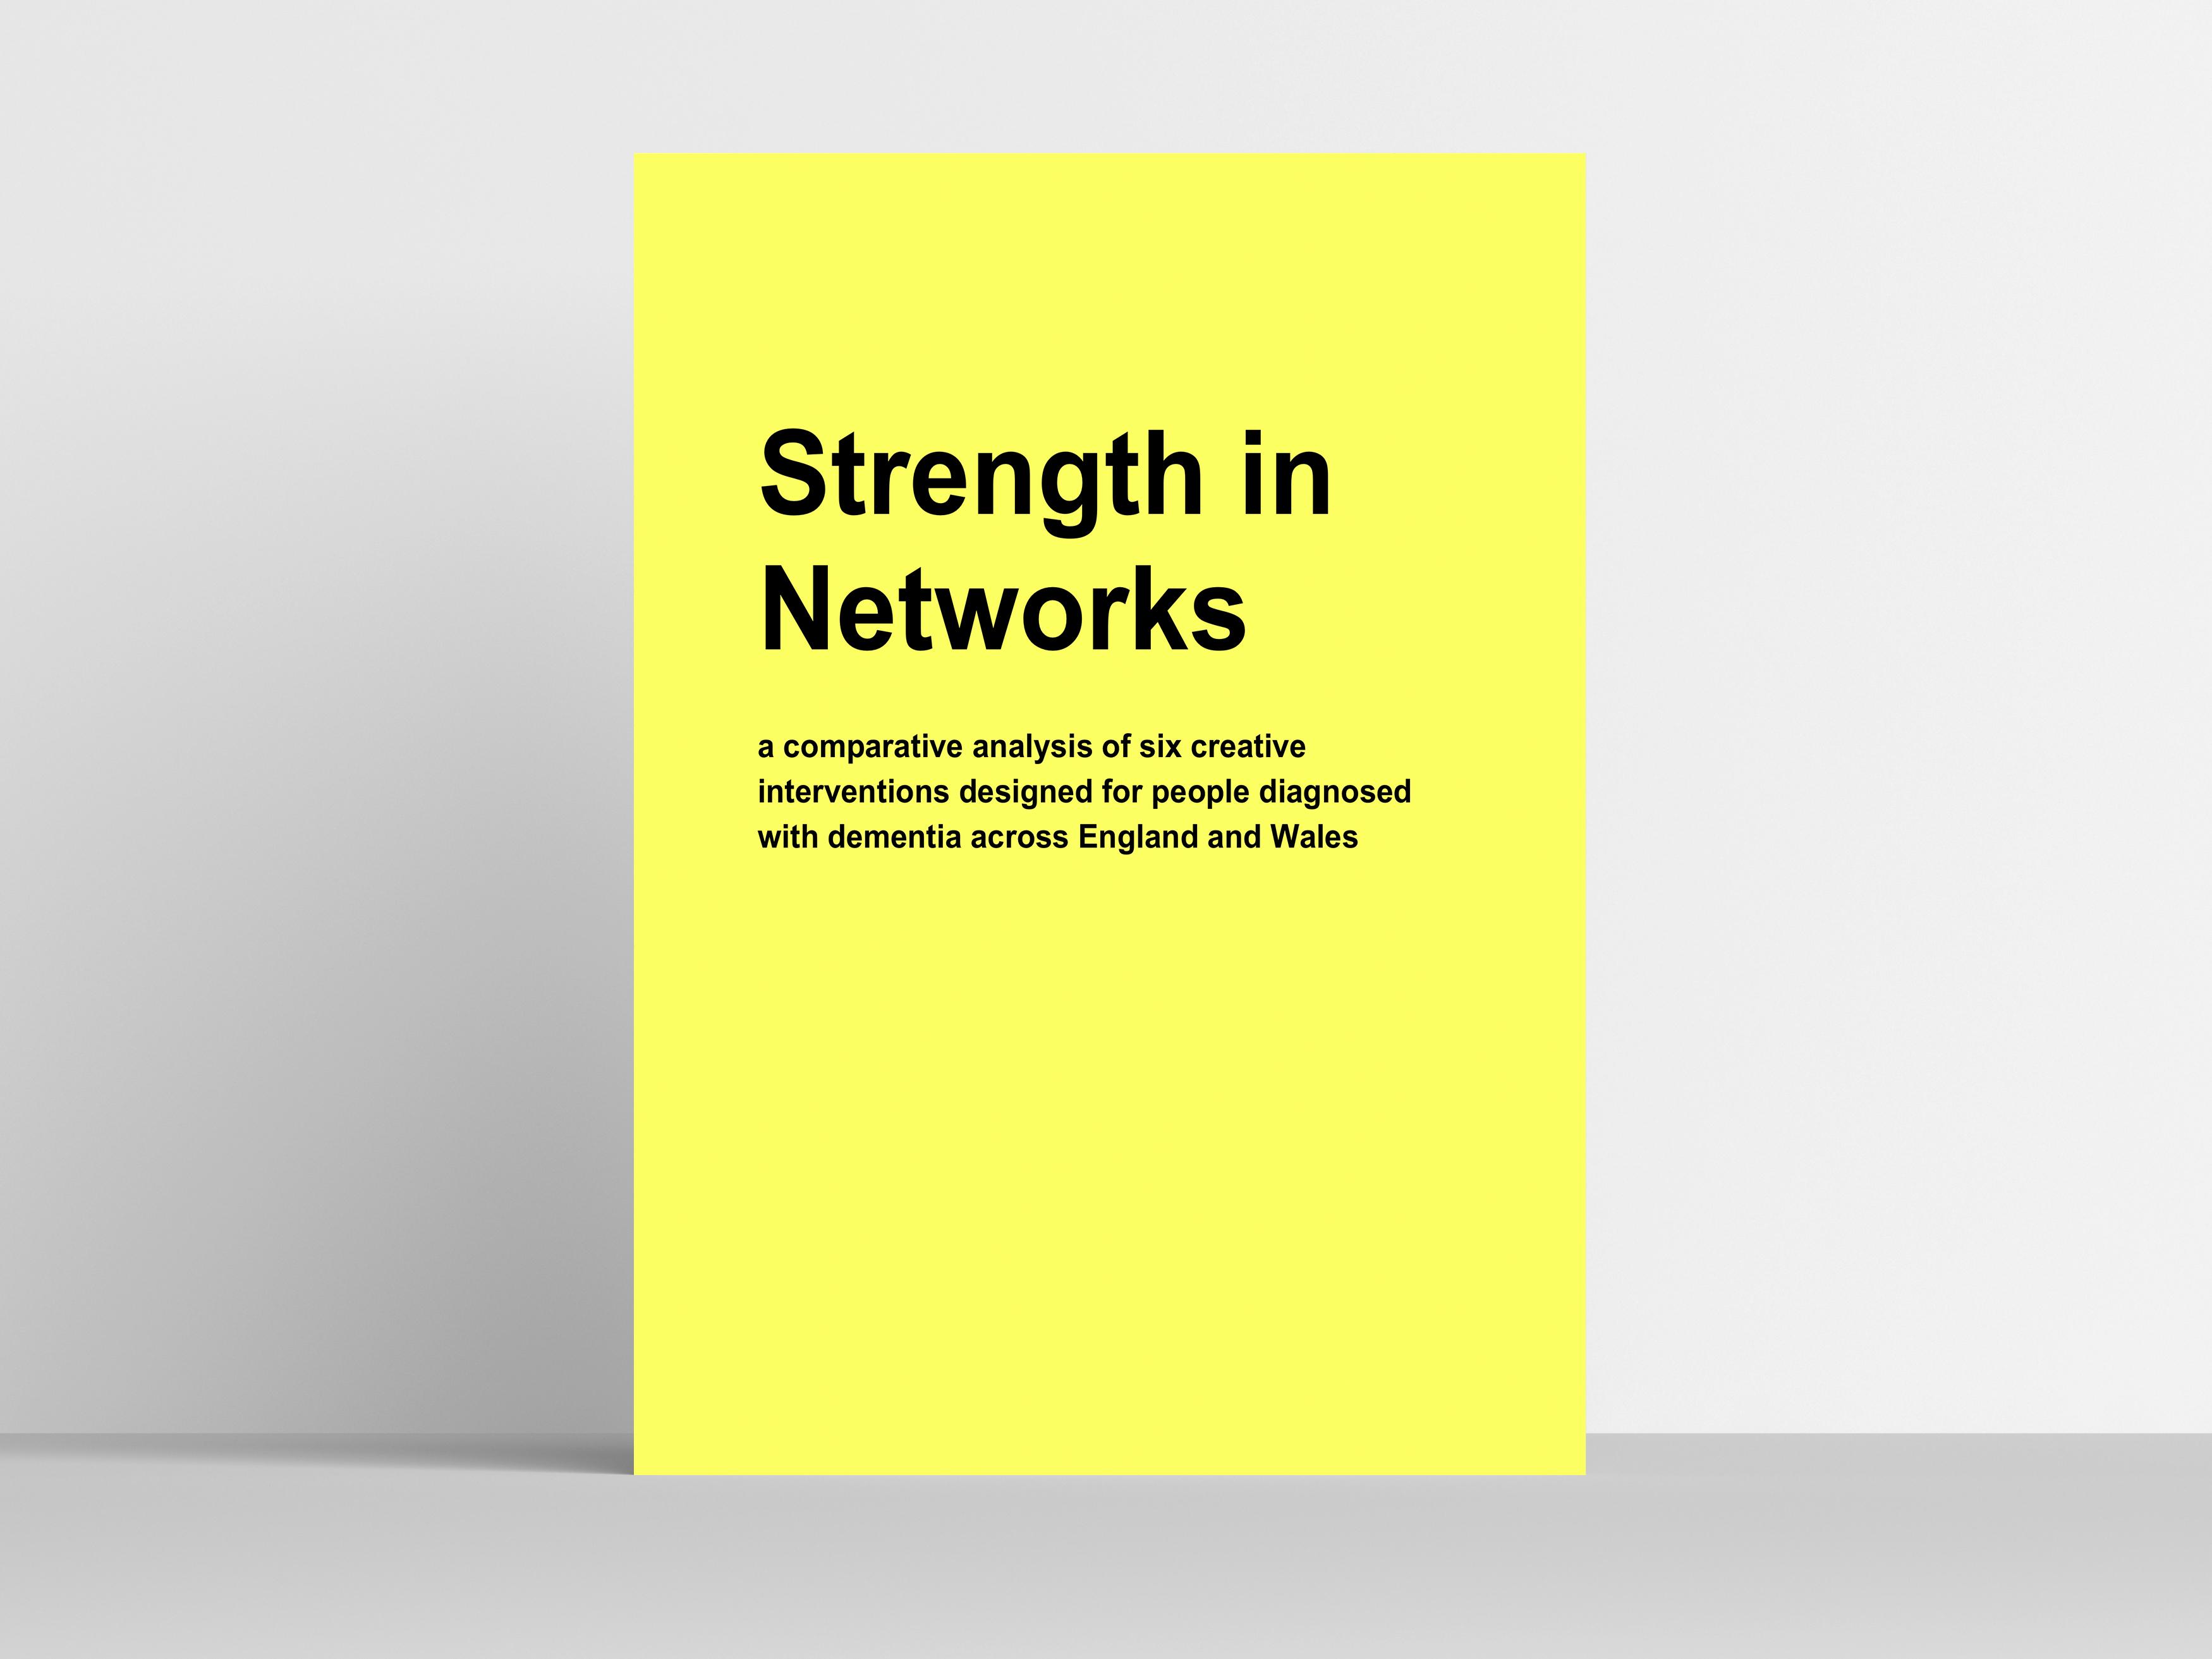 https://musica-music.co.uk/wp-content/uploads/2018/10/Strength-in-networks-final.jpg